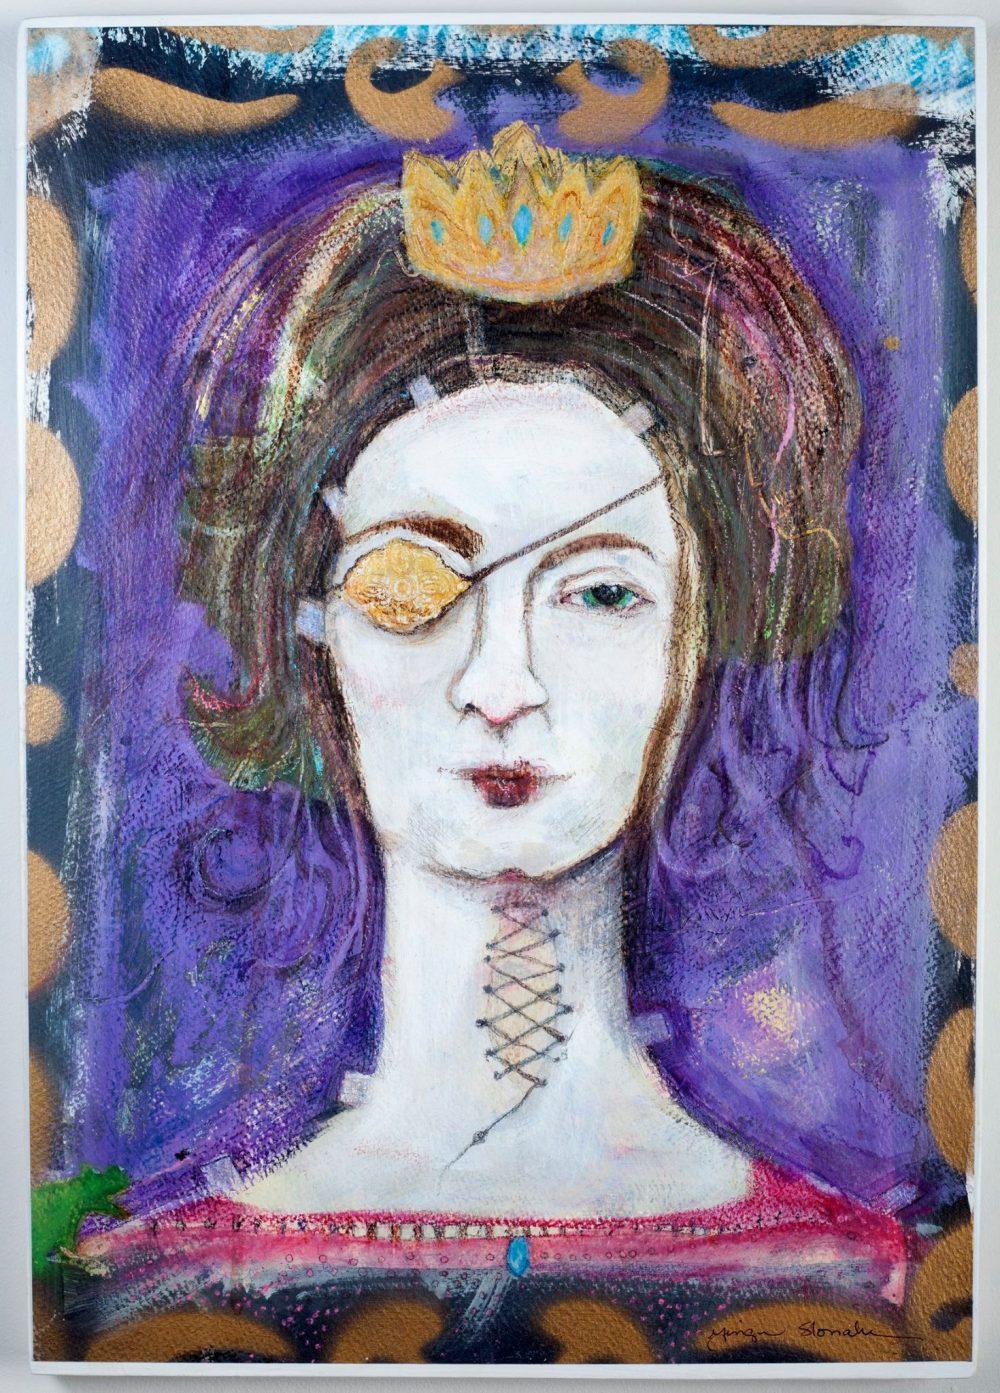 Artist: Ginger Slonaker. Used withpermission